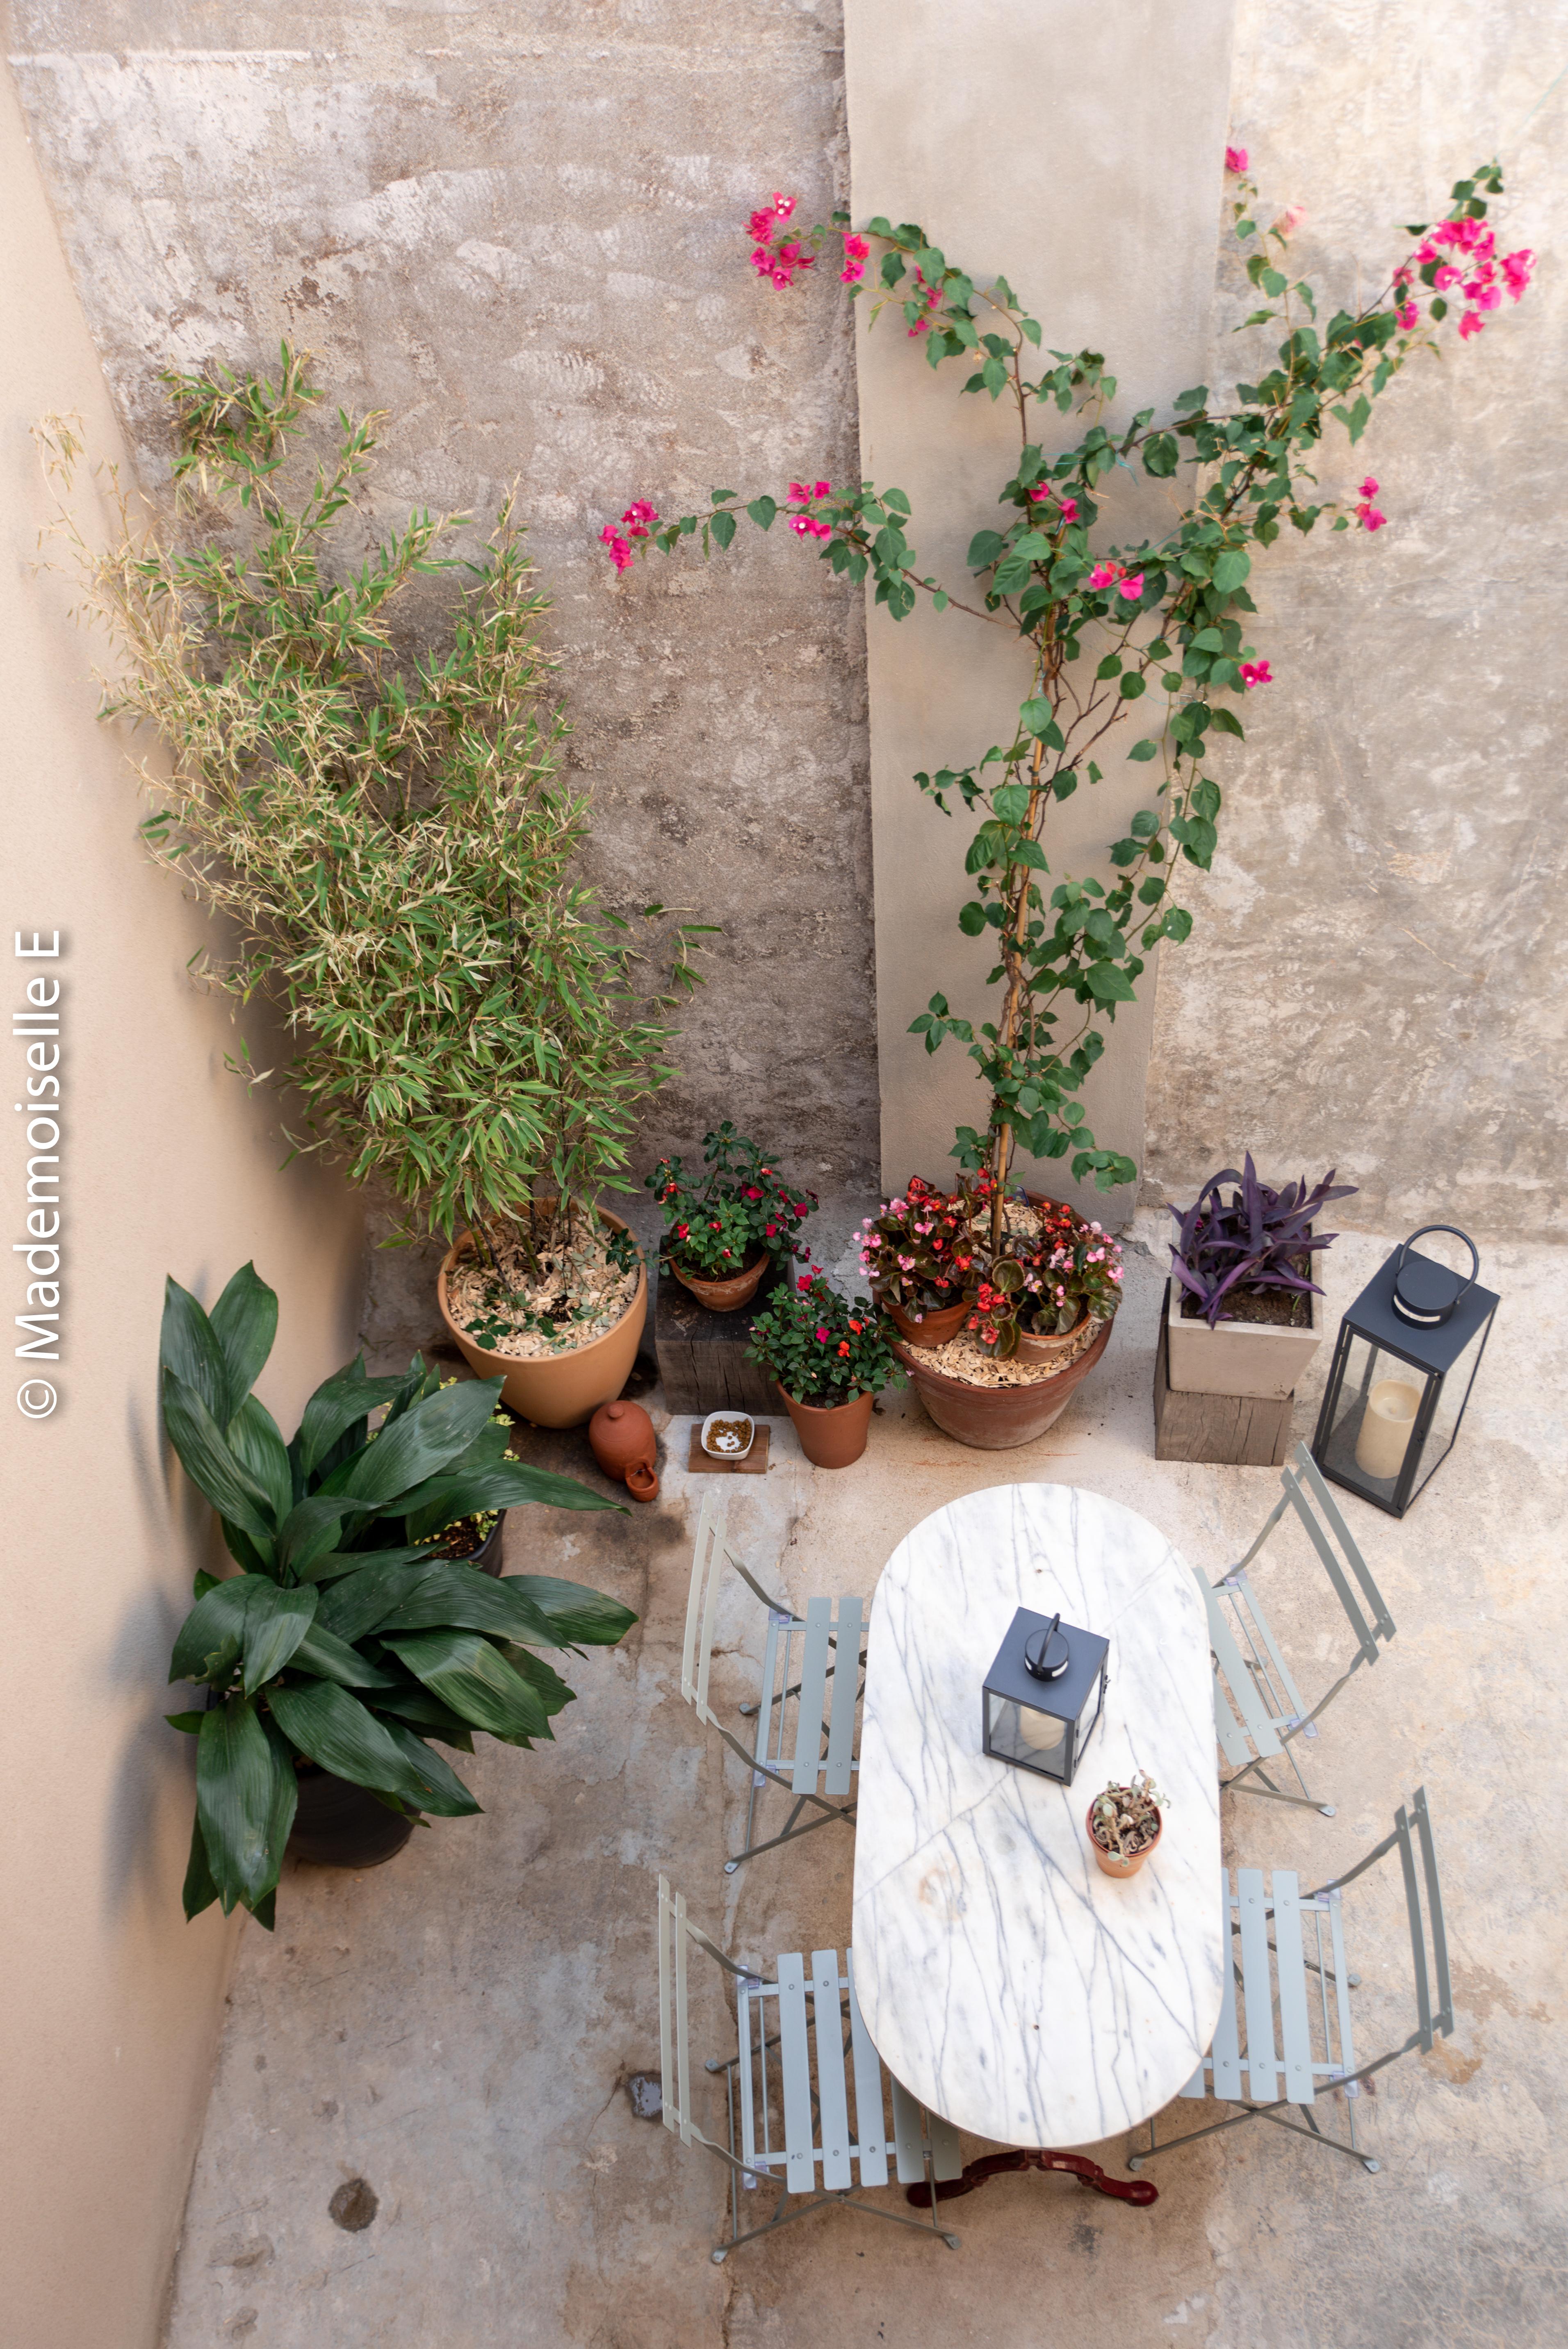 5-conseils-pour-amenager-sa-terrasse-1-mademoiselle-e